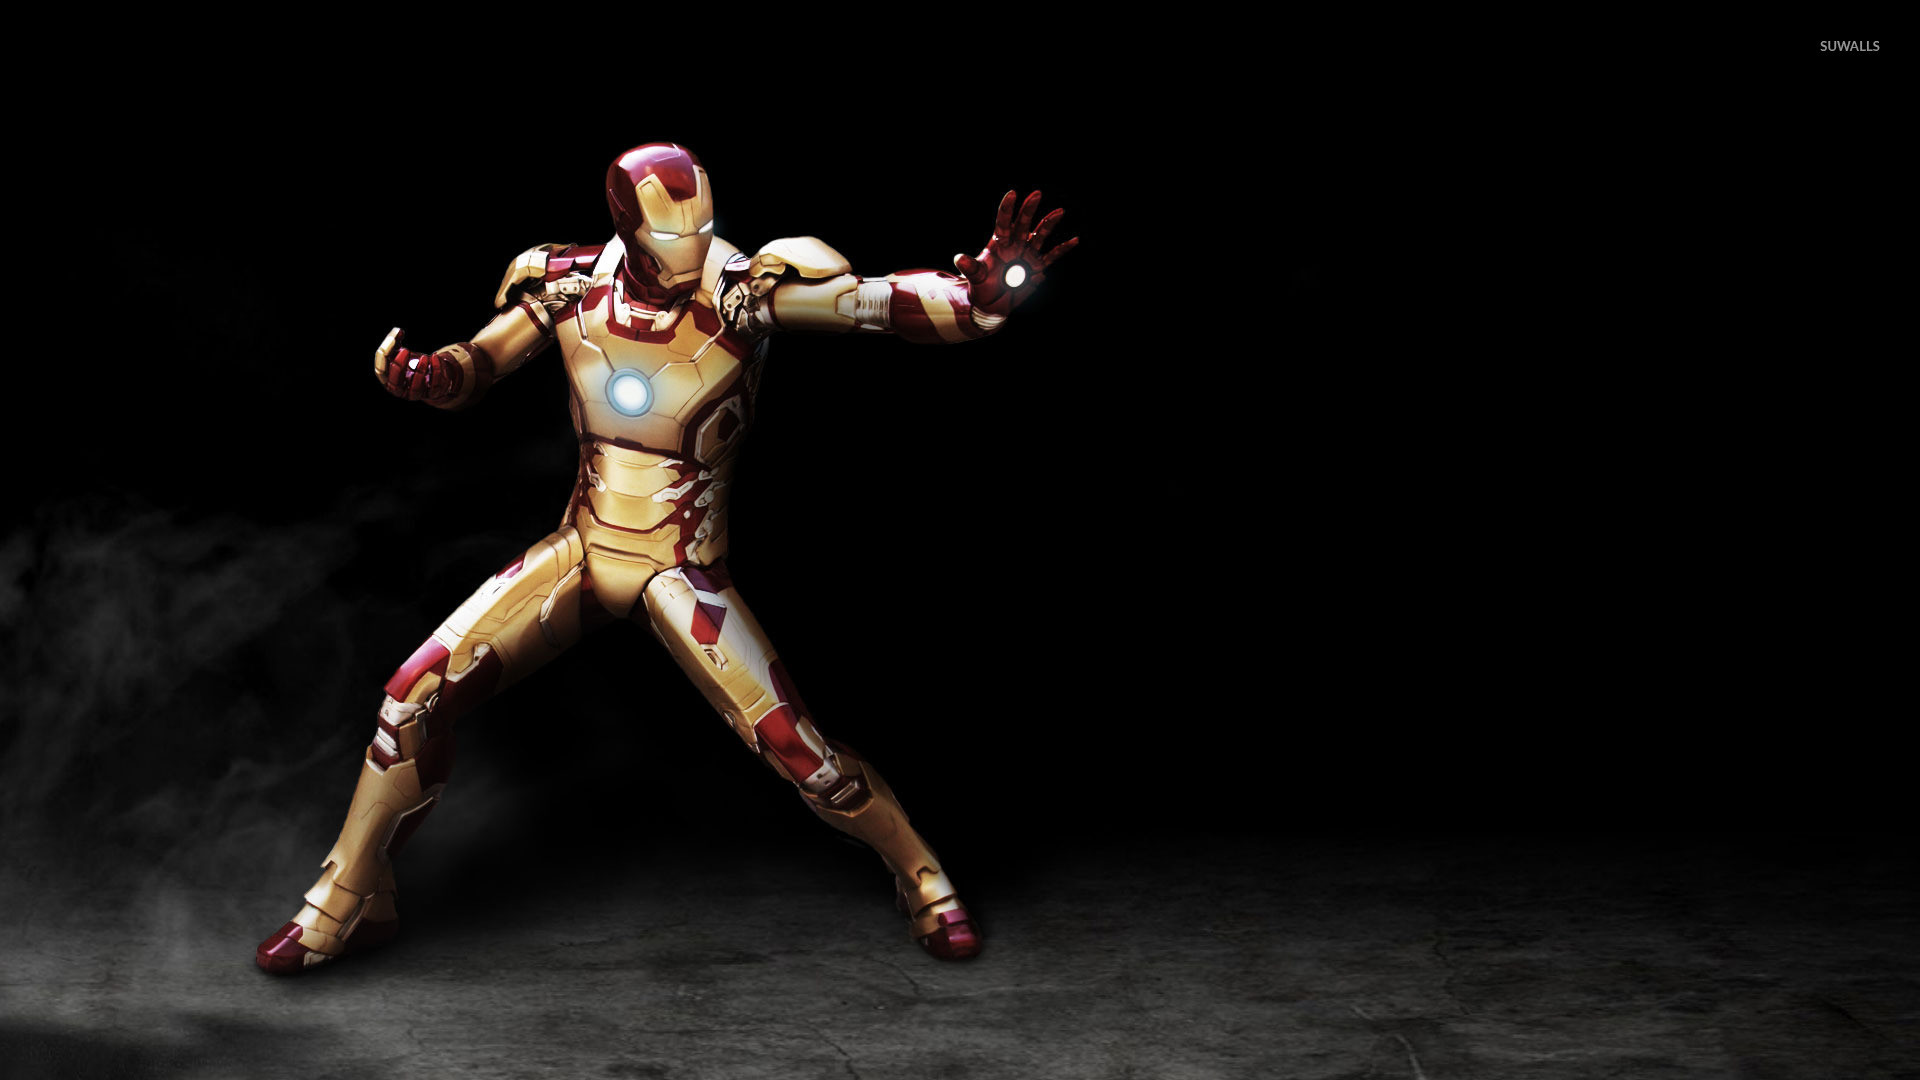 Iron Man 3 [4] wallpaper jpg